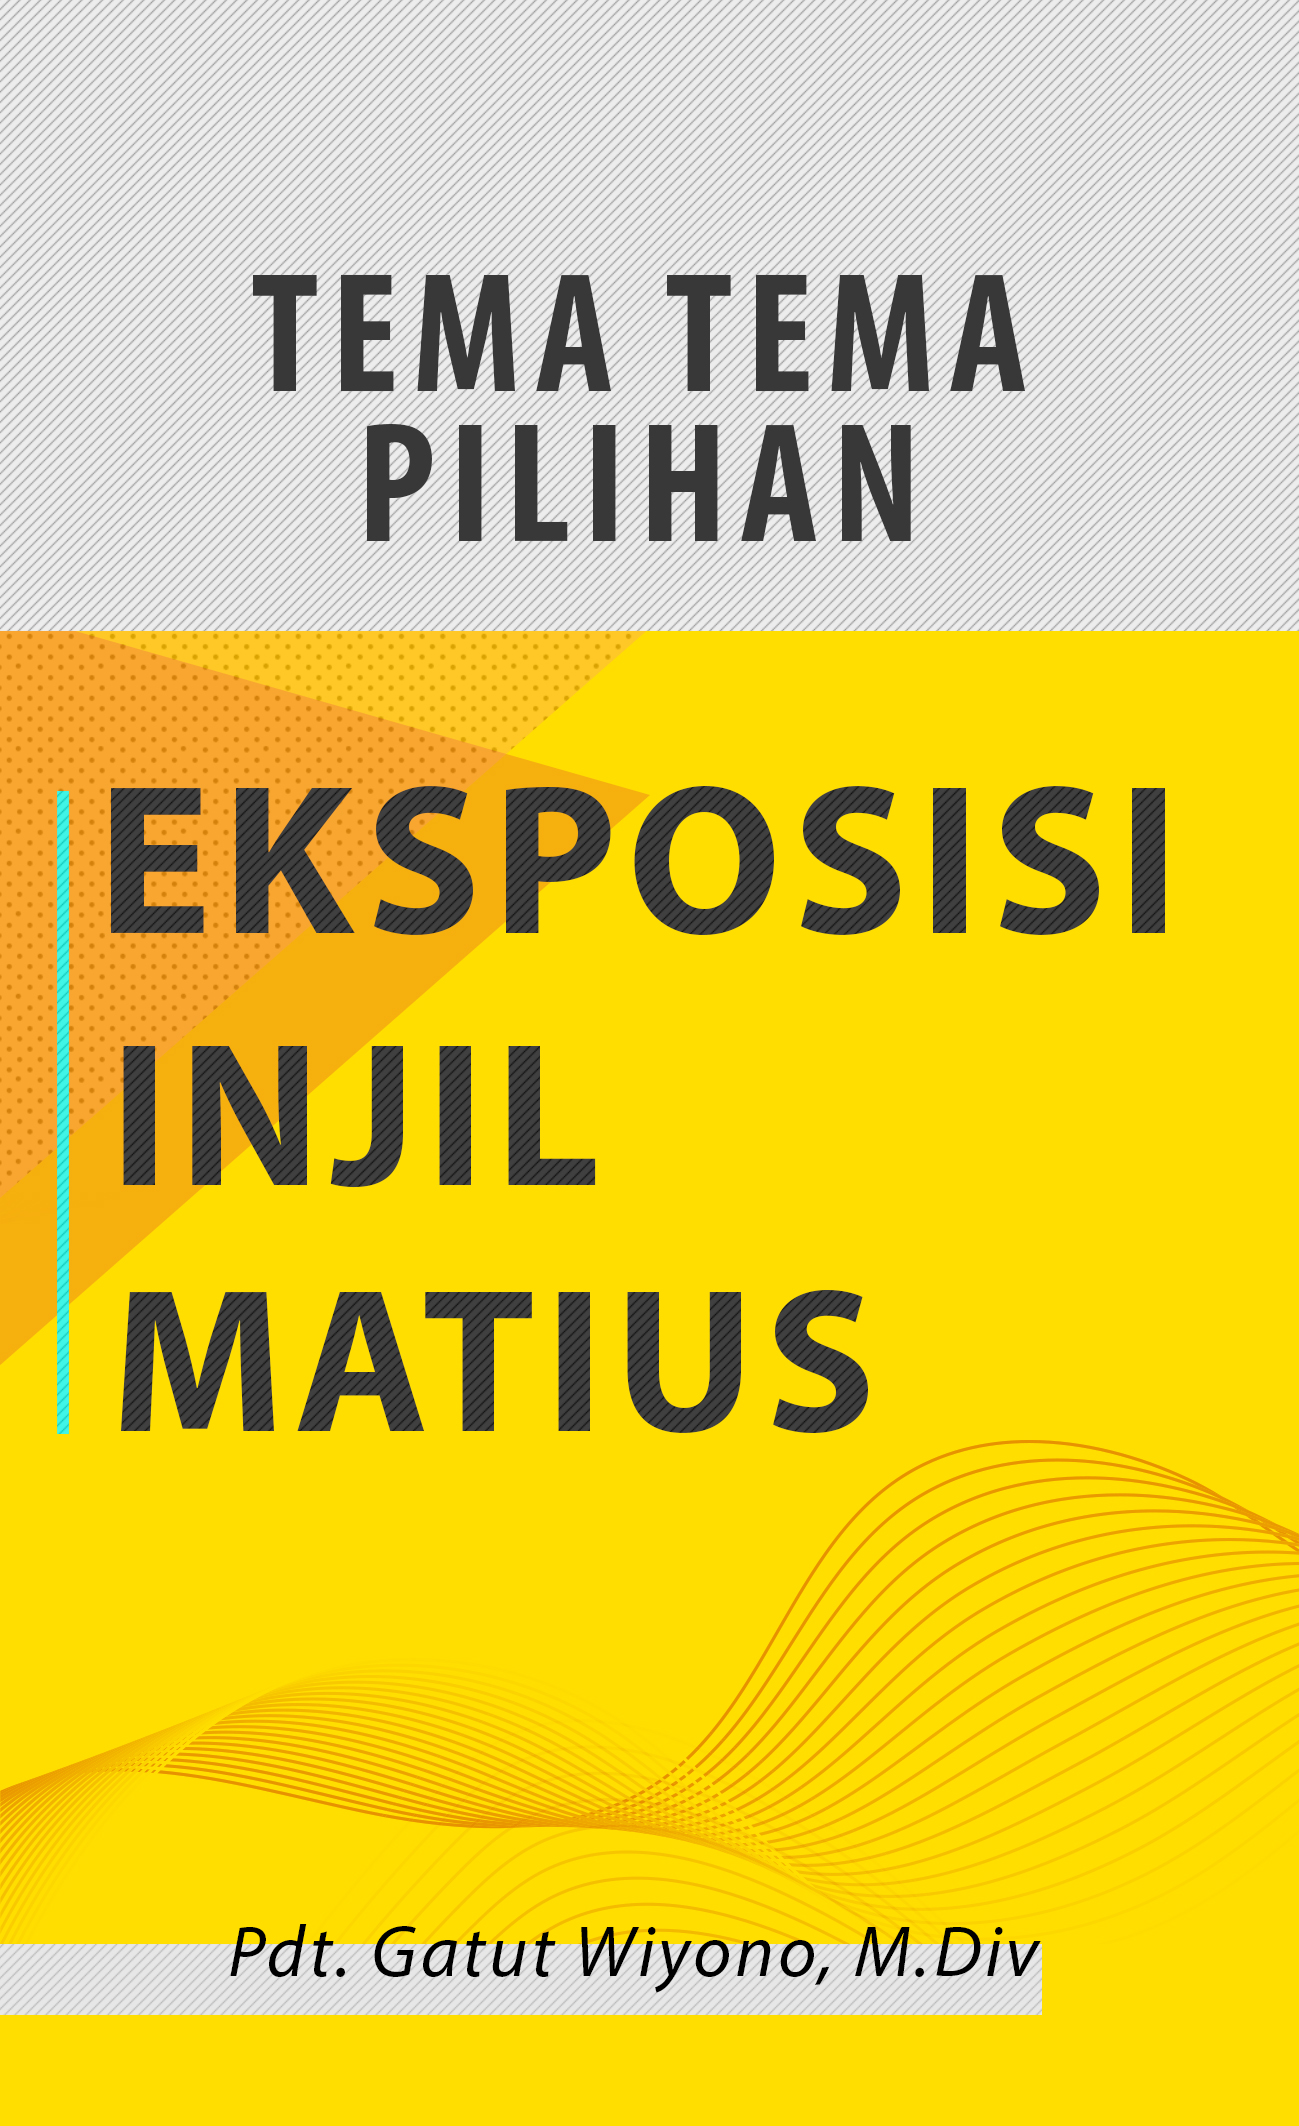 Tema tema pilihan [sumber elektronis] : eksposisi Injil Matius